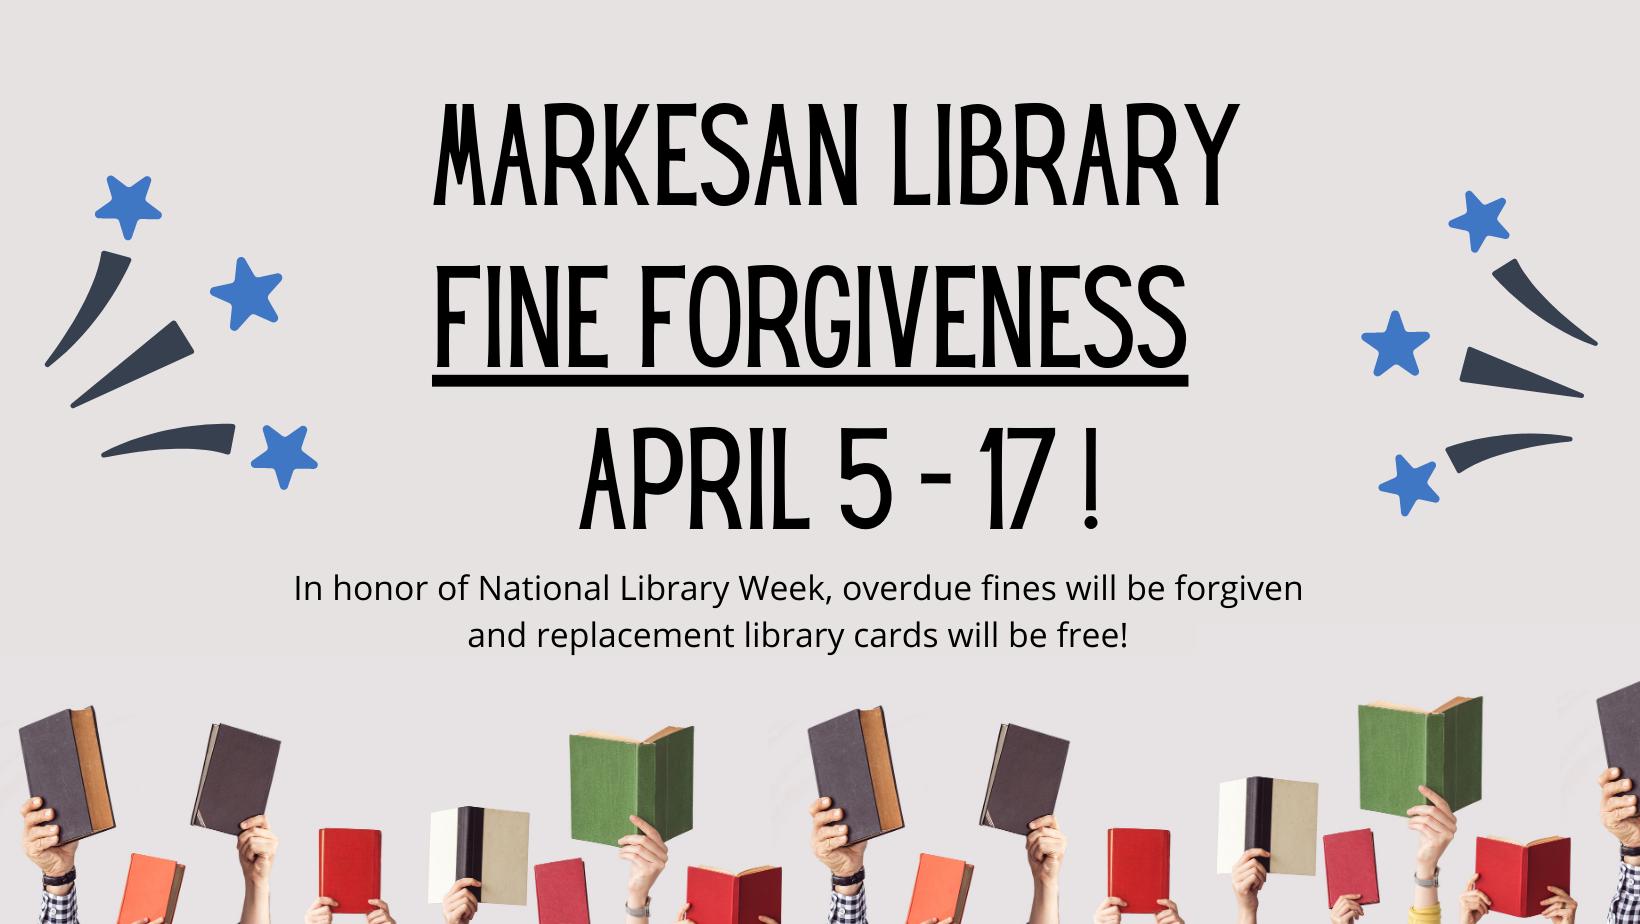 Fine Forgiveness April 5 - 17, 2021